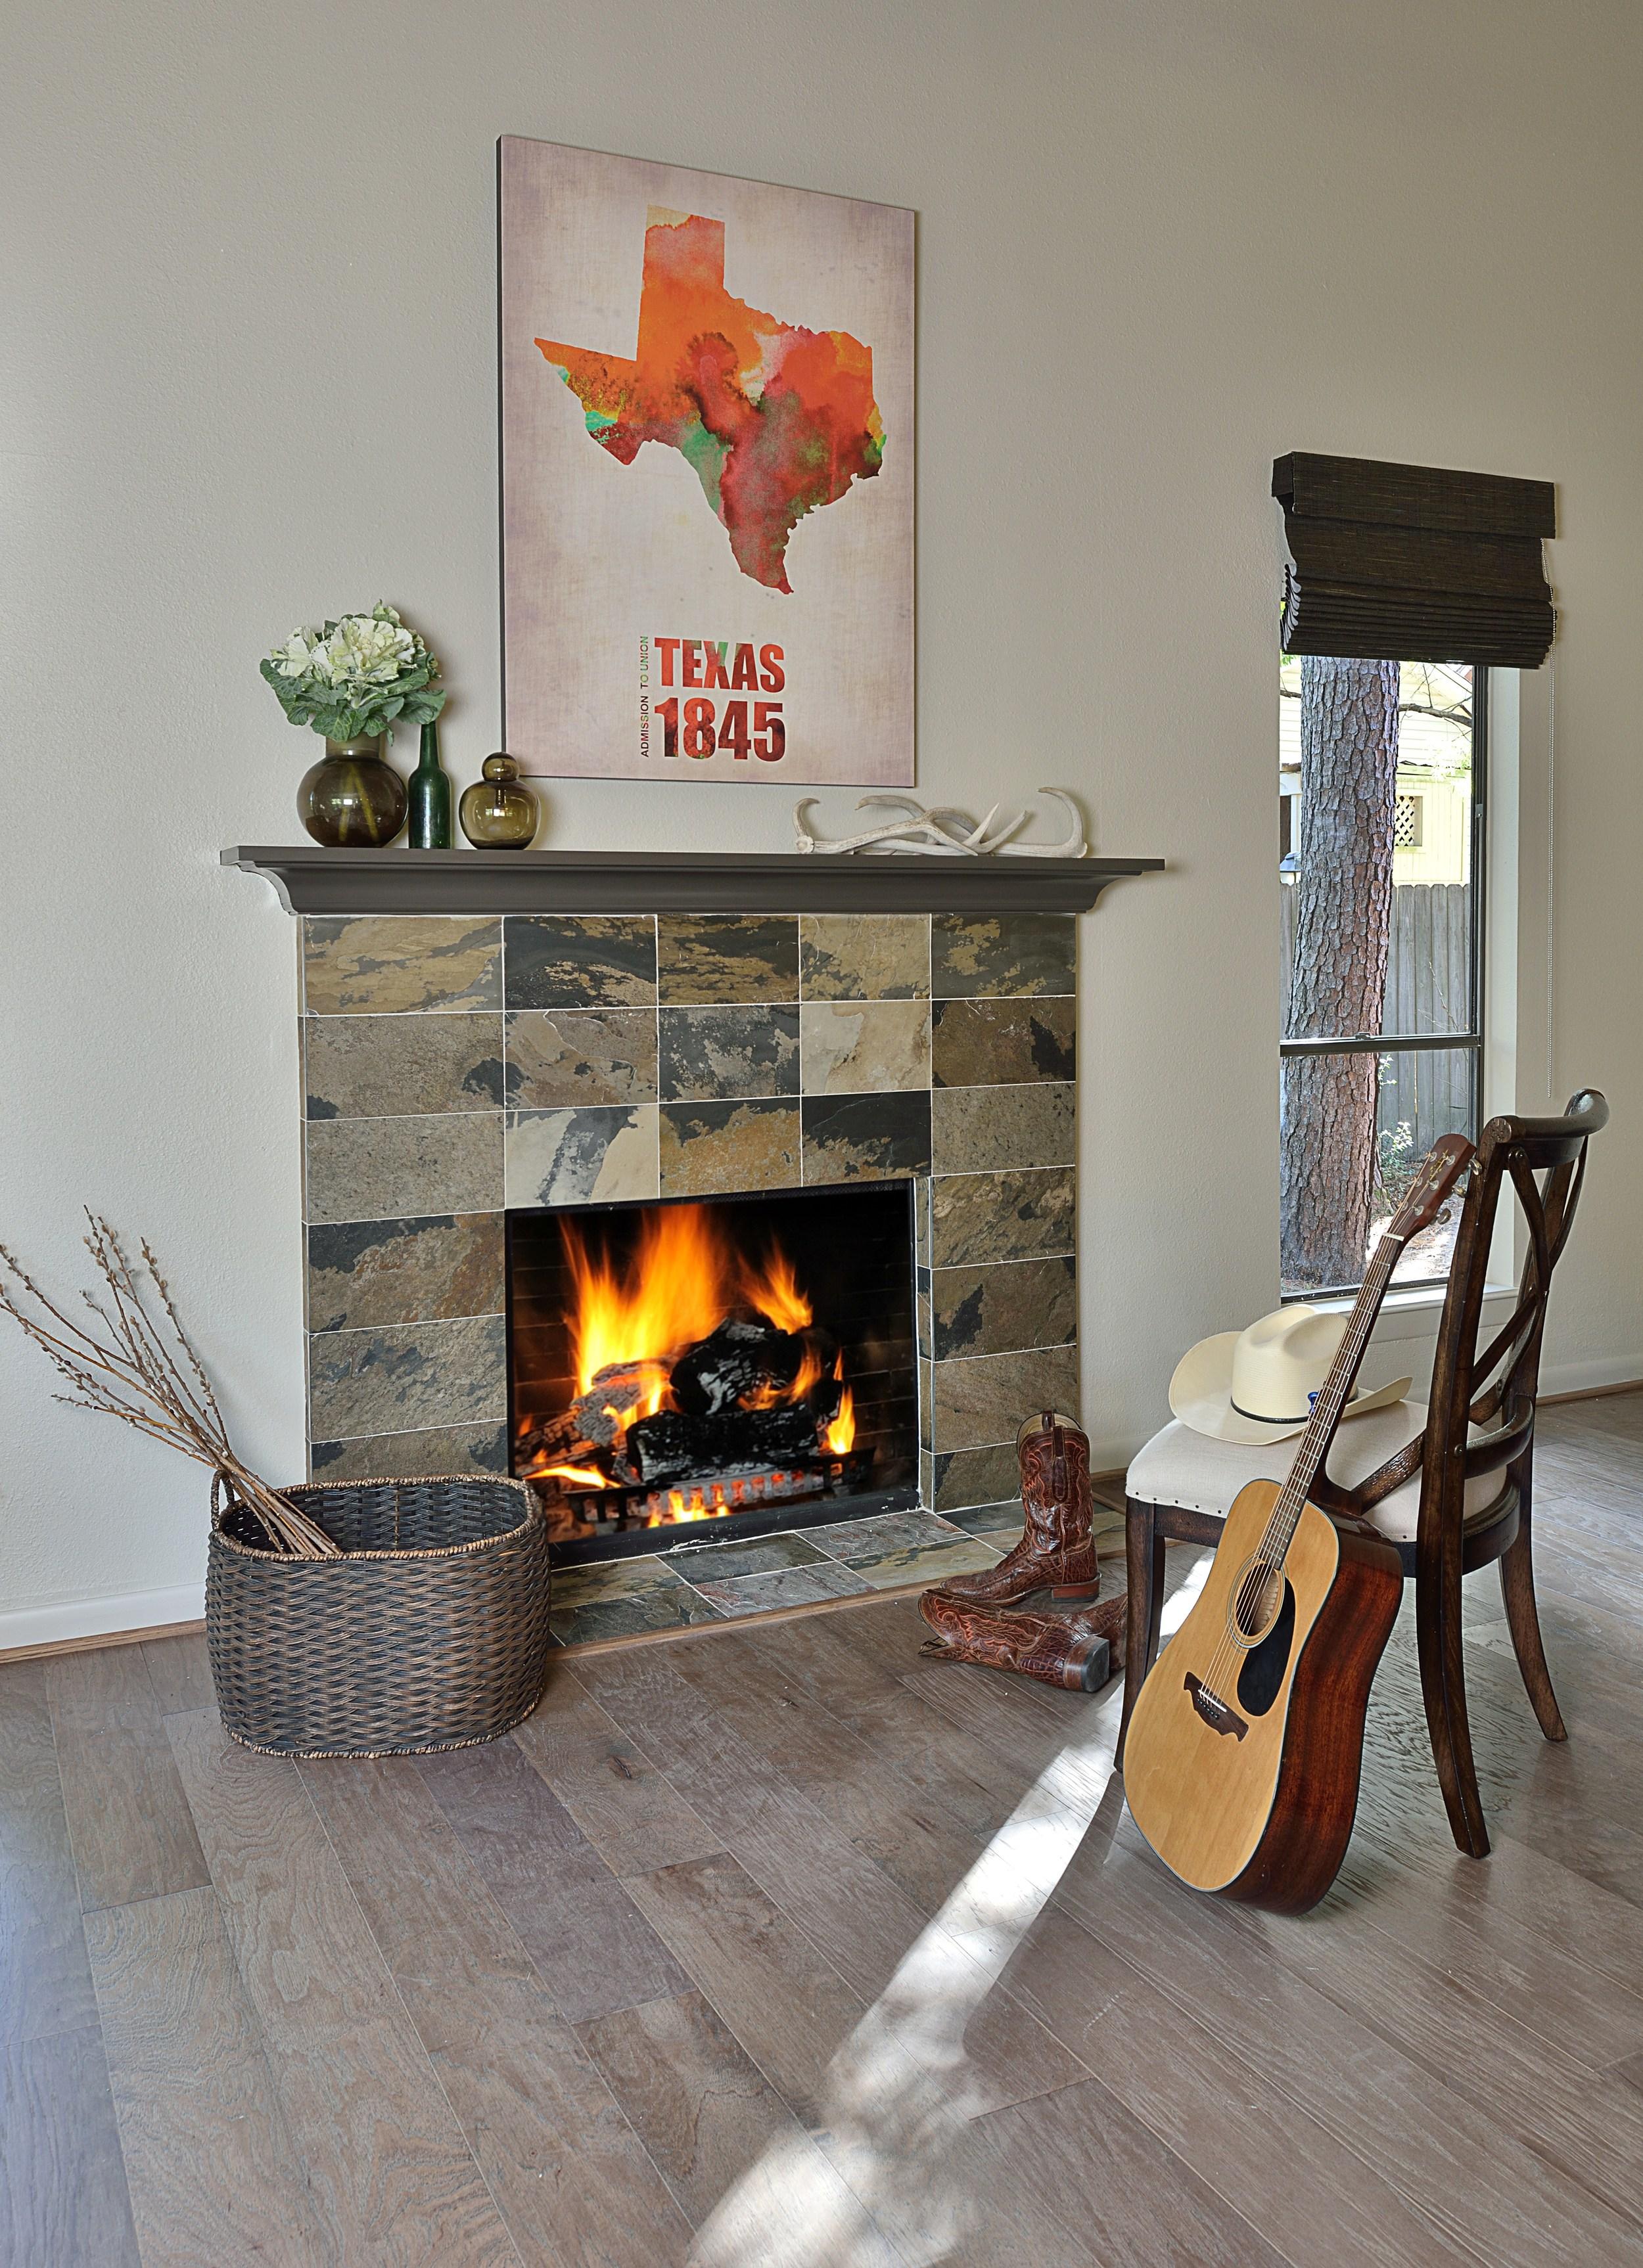 Bachelor's First Home - Remodel, Designer: Carla Aston